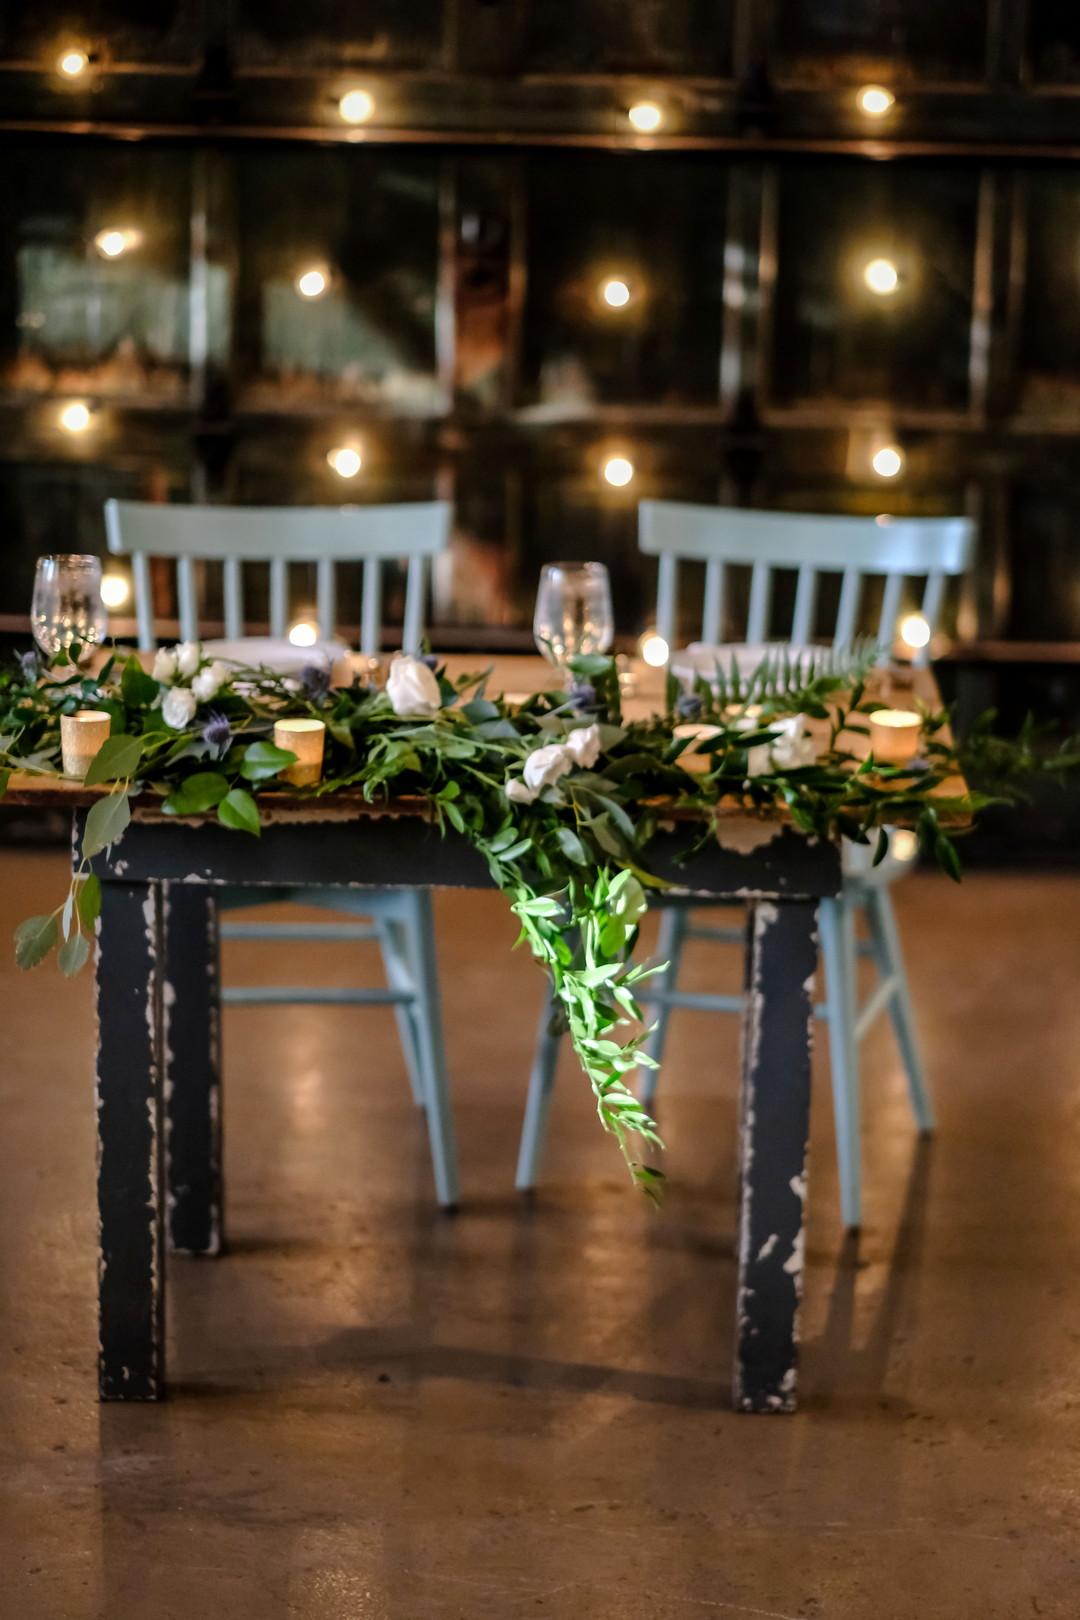 south-soho-cafe-wedding-20.jpg